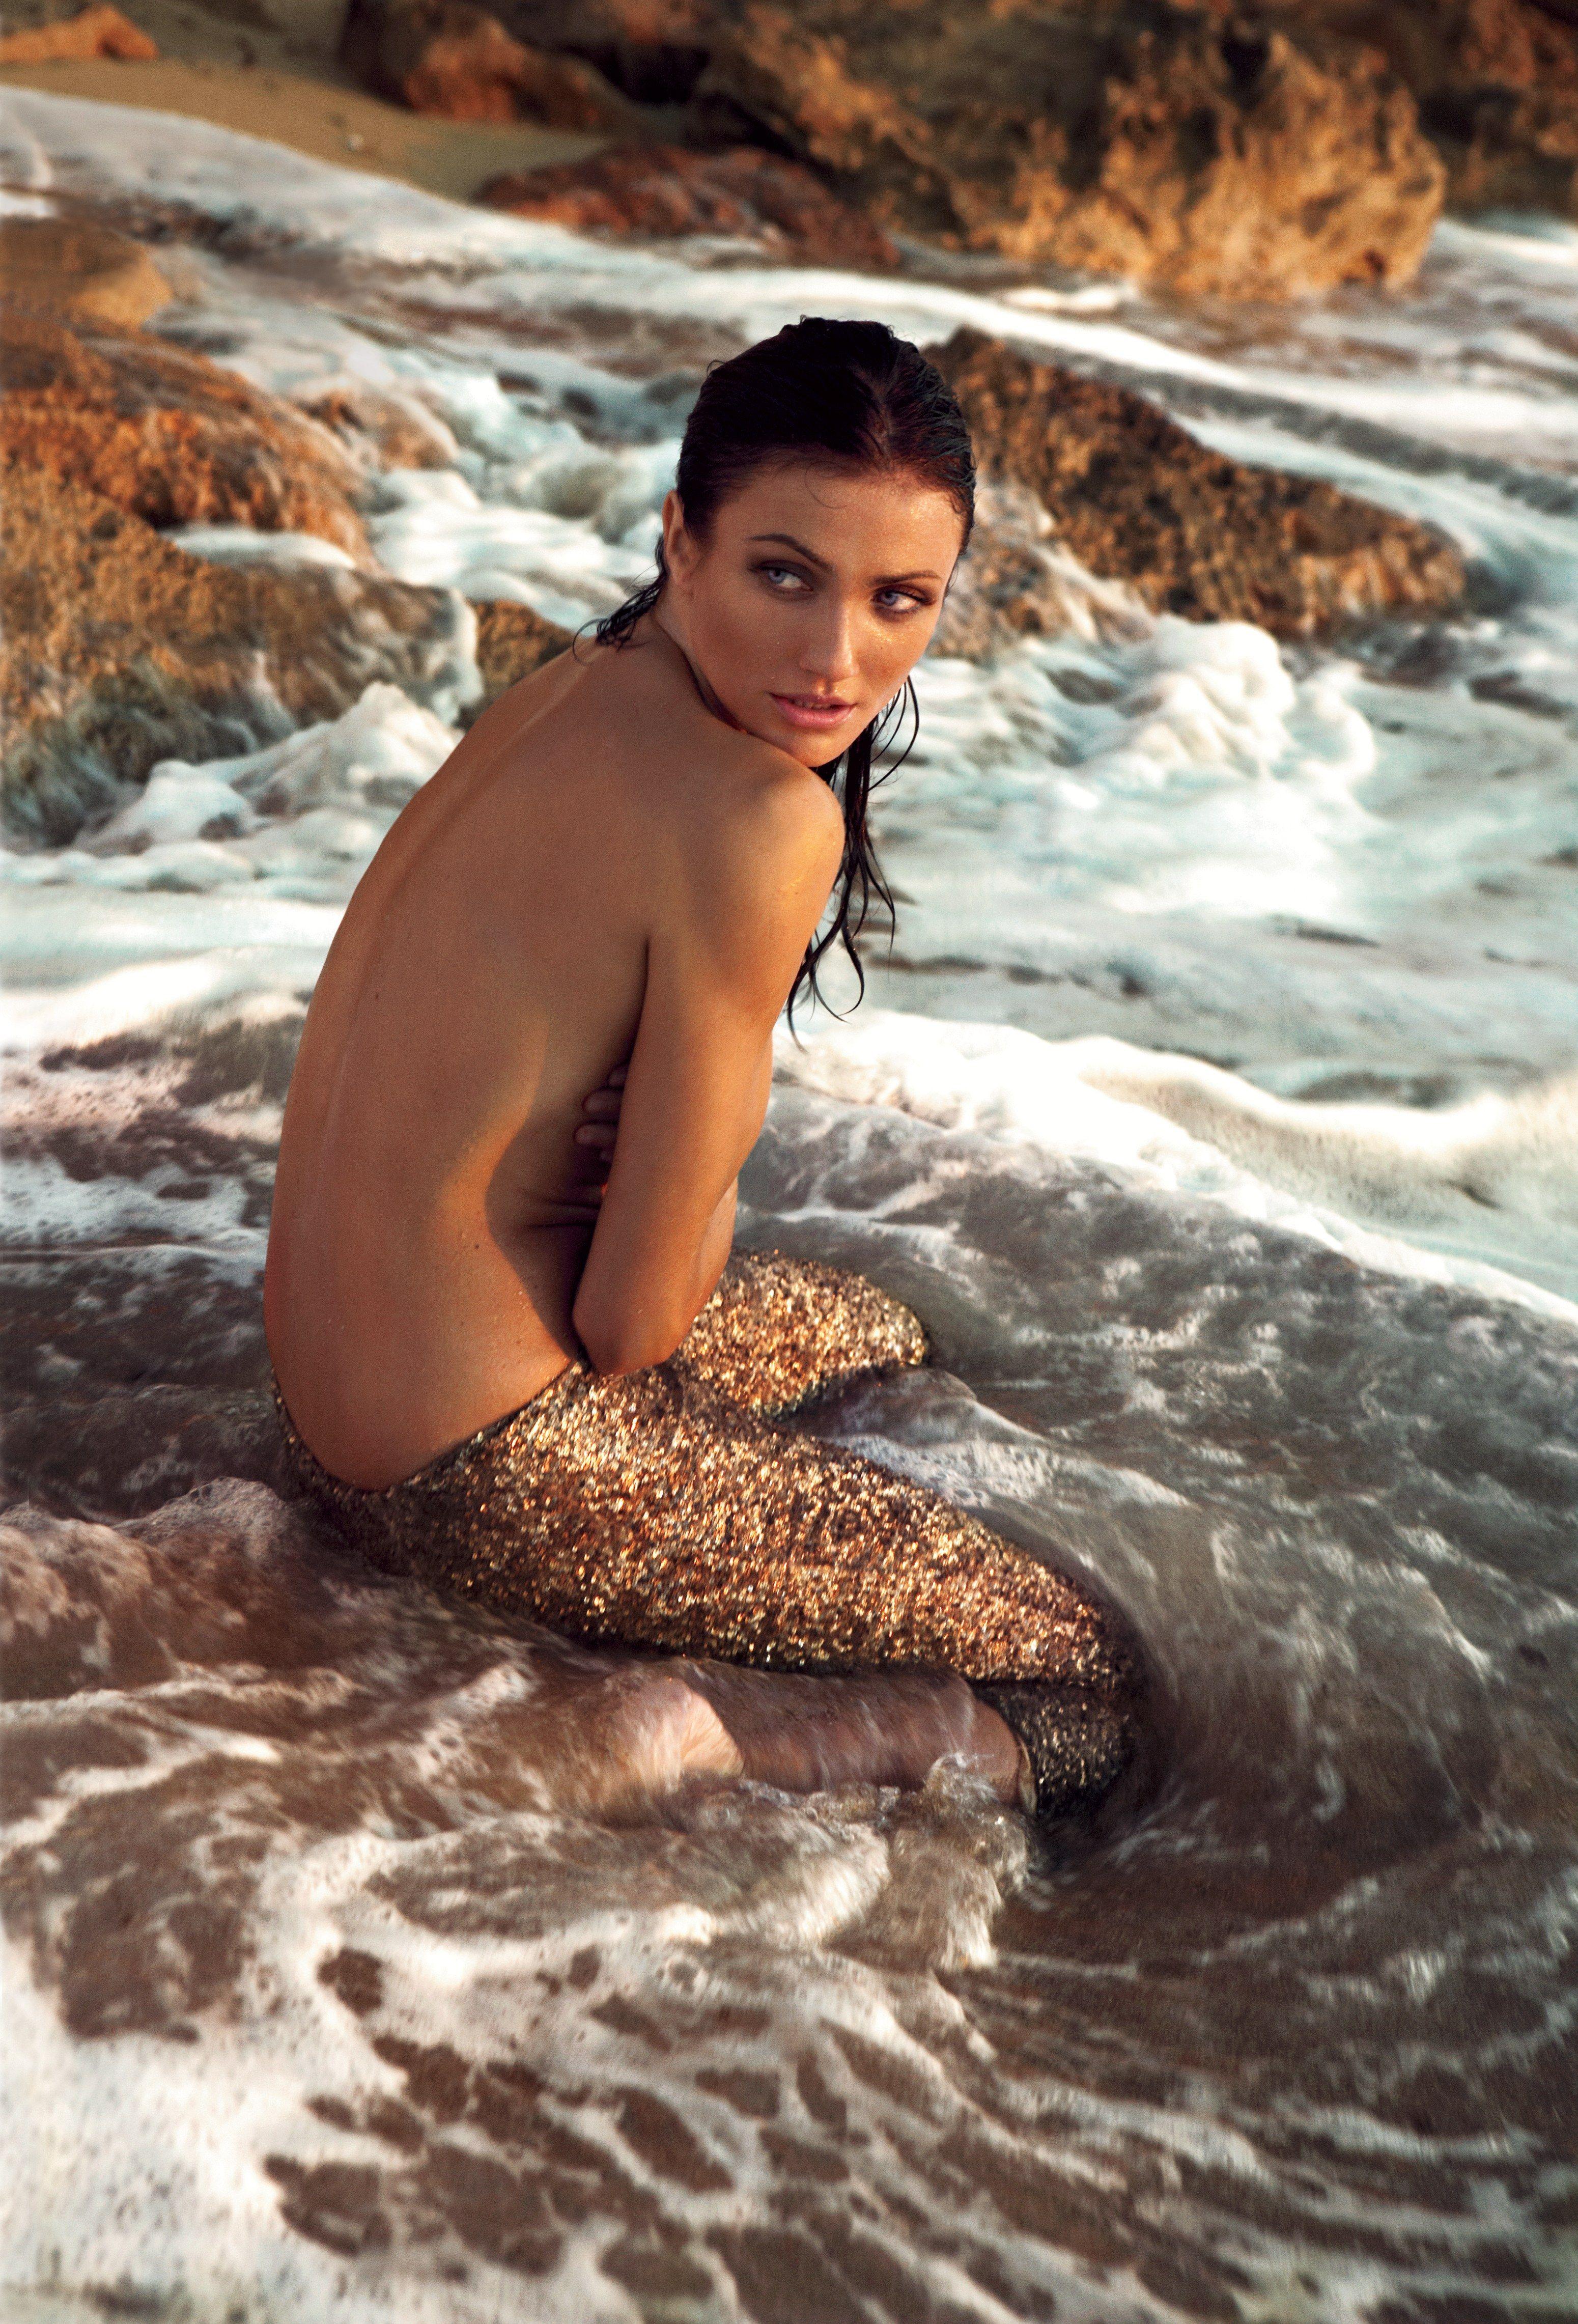 Cameron Diaz, a movie star that belongs on the beach ... Cameron Diaz Movies 2006